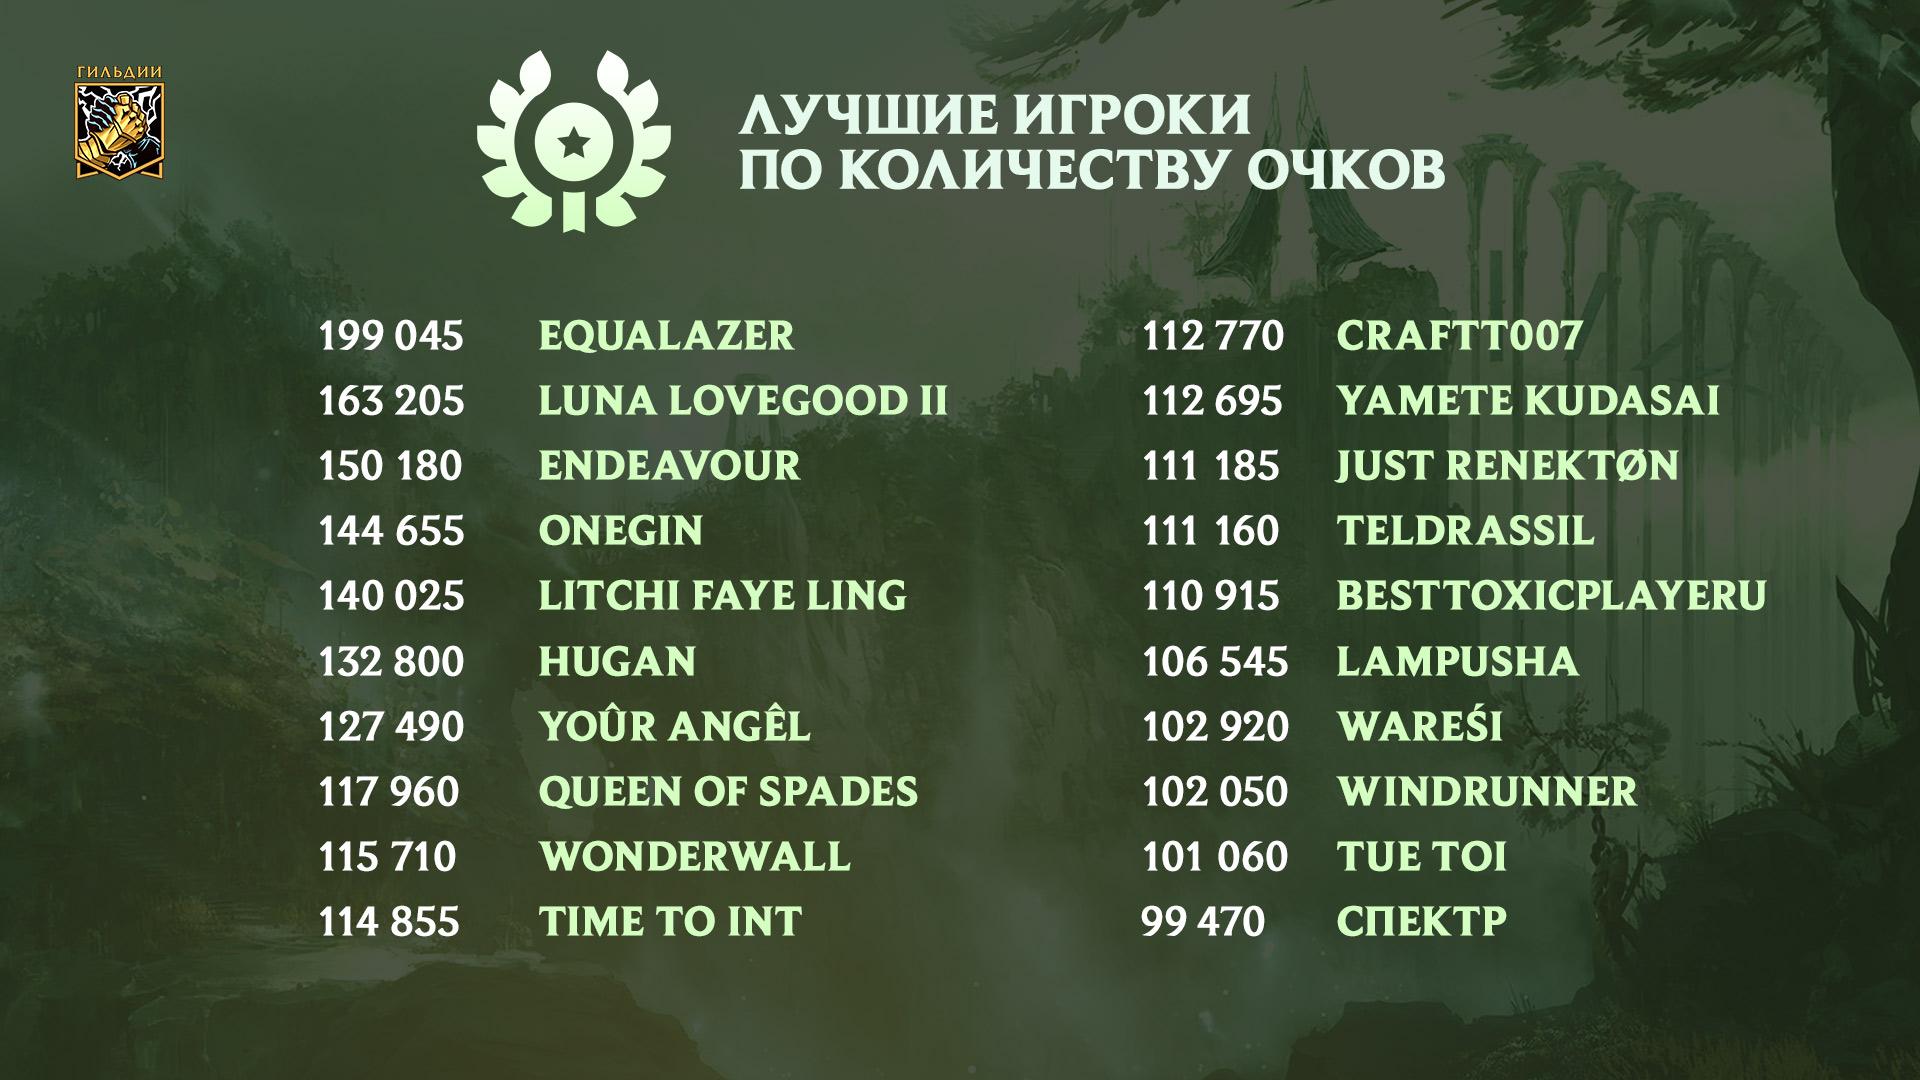 best_players_infogr.jpg